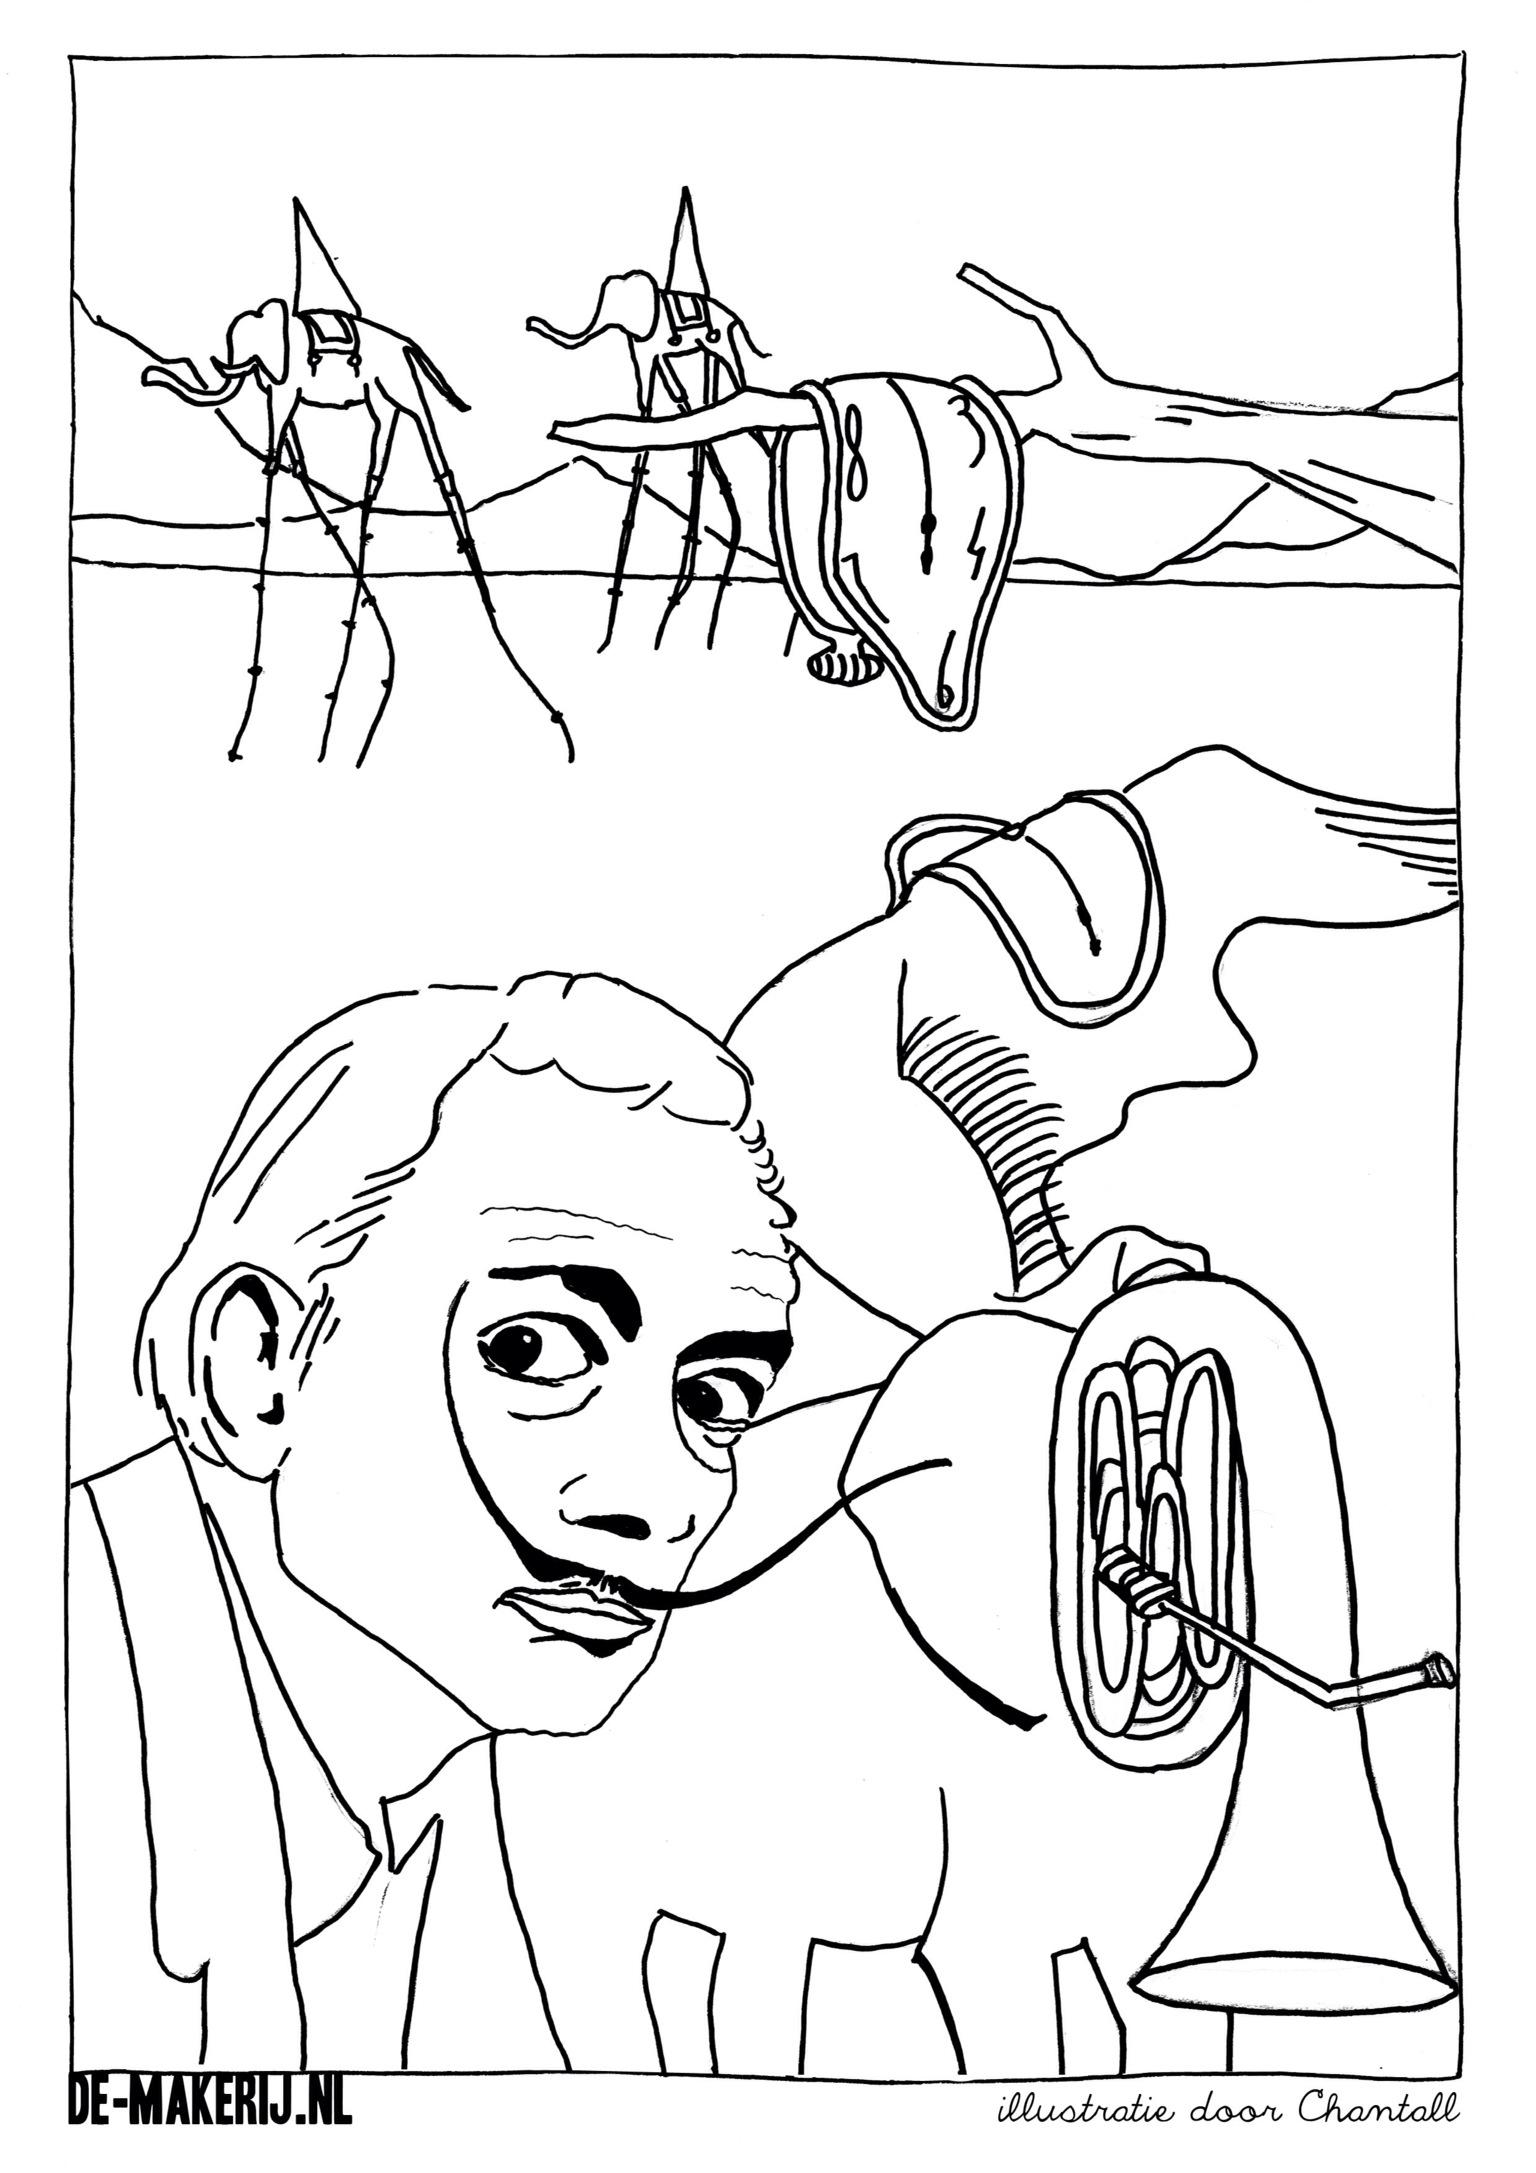 Salvador Dali Coloring Pages At Getdrawings